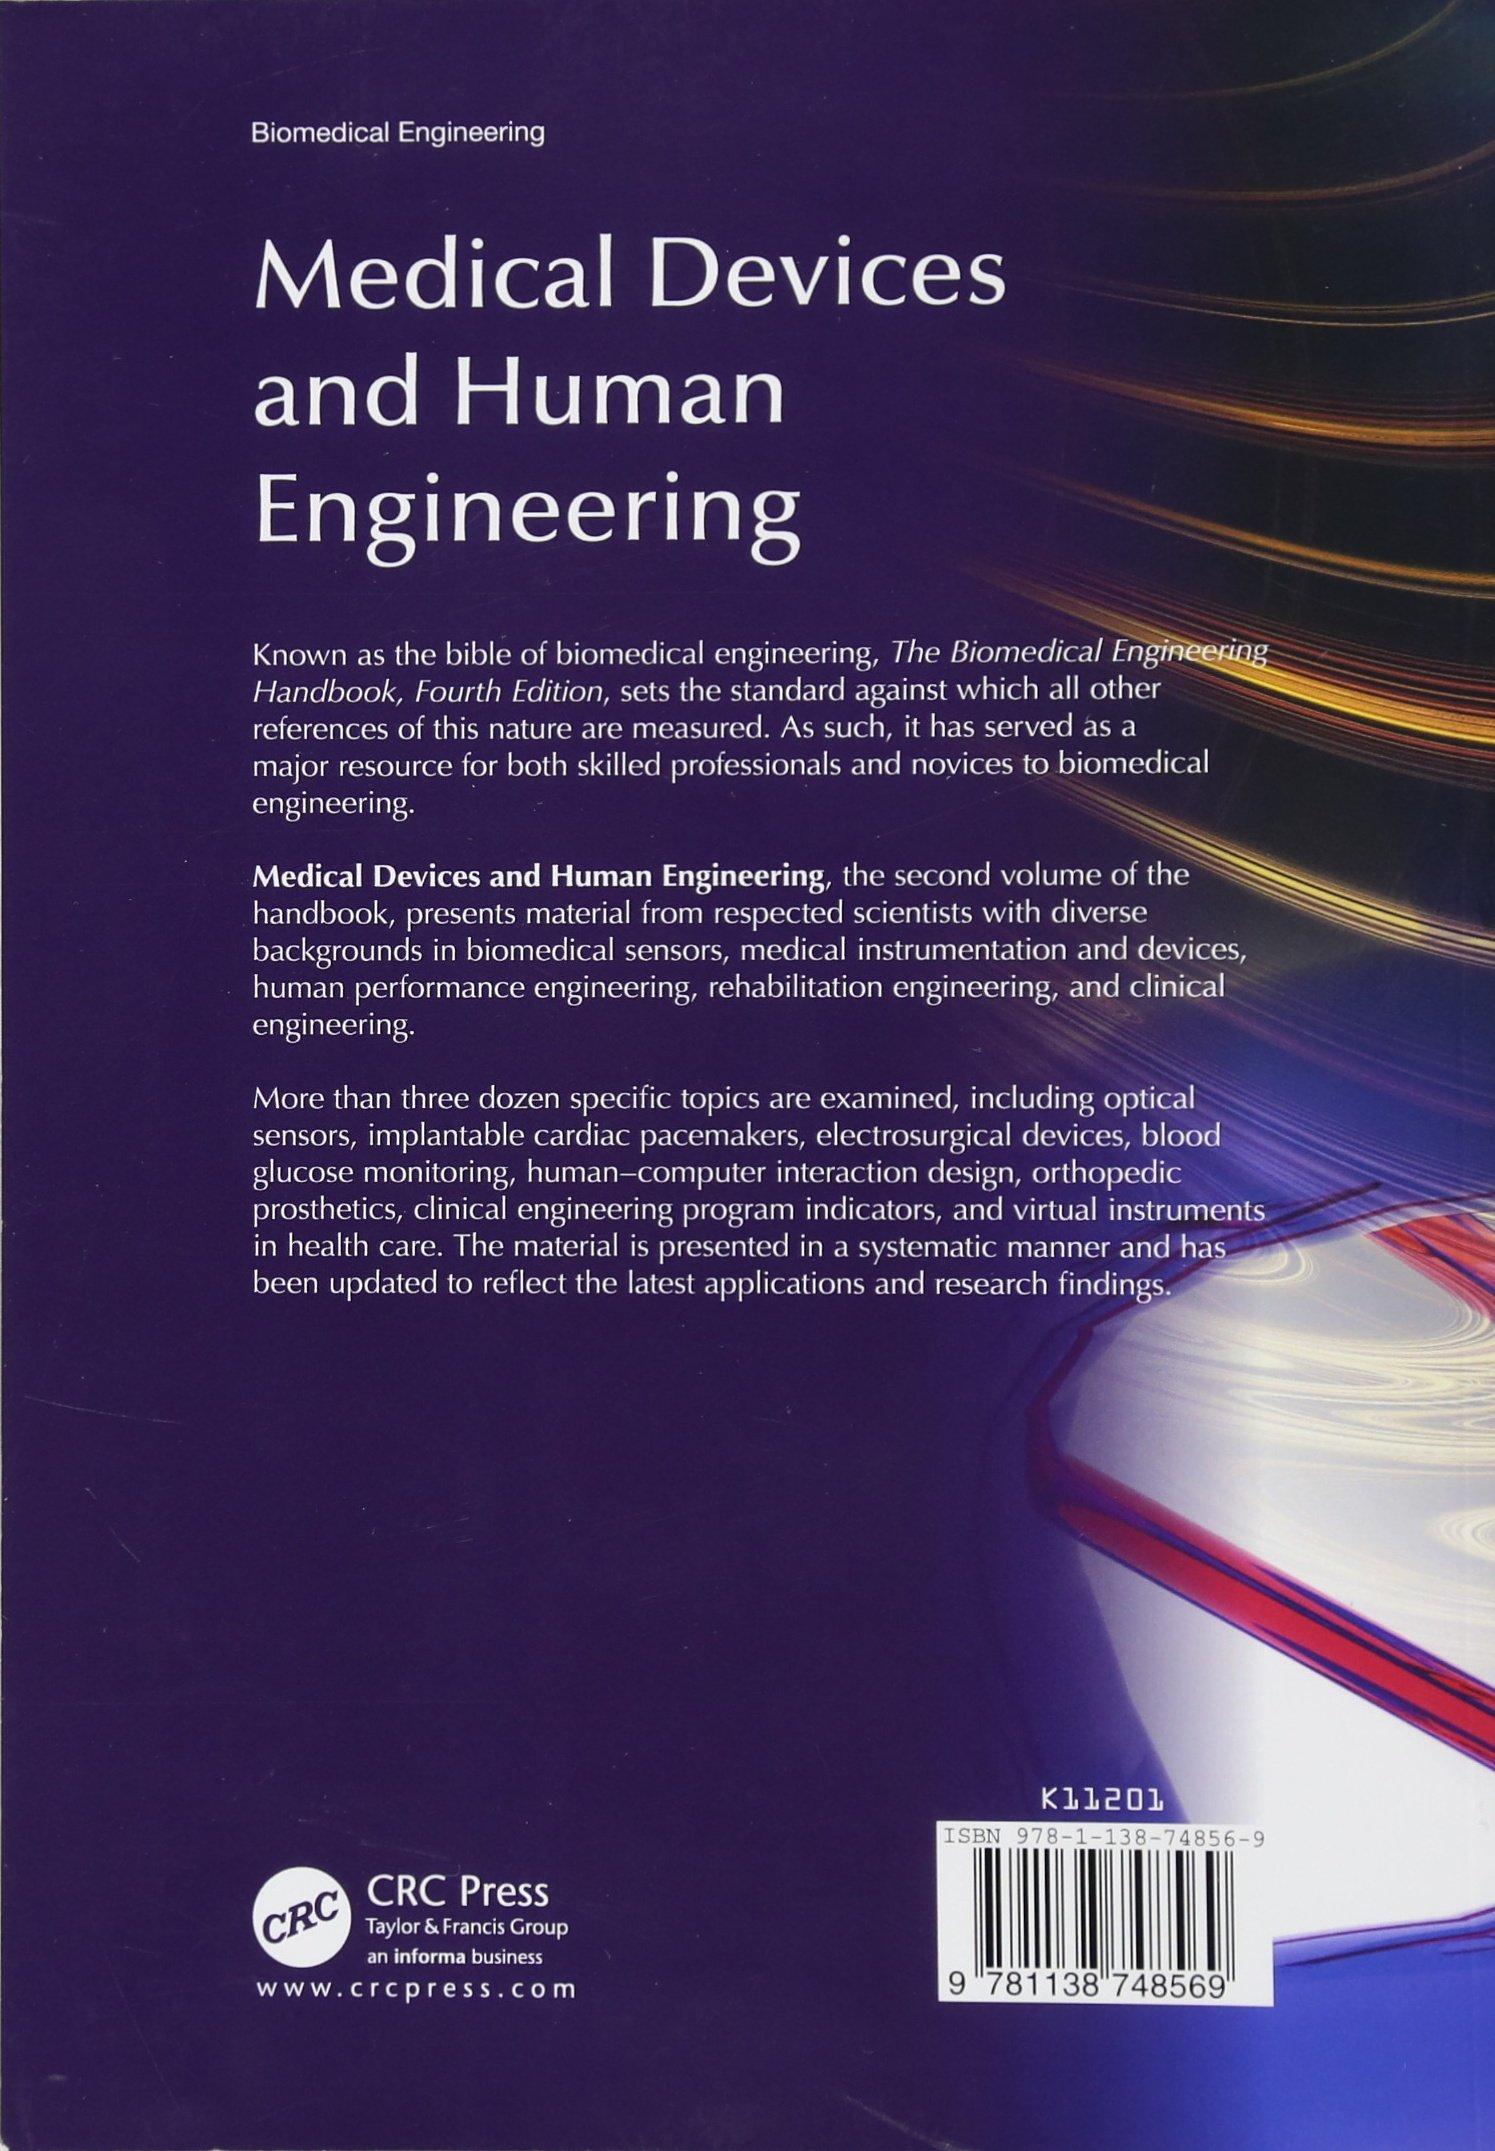 biomedical topics in health care